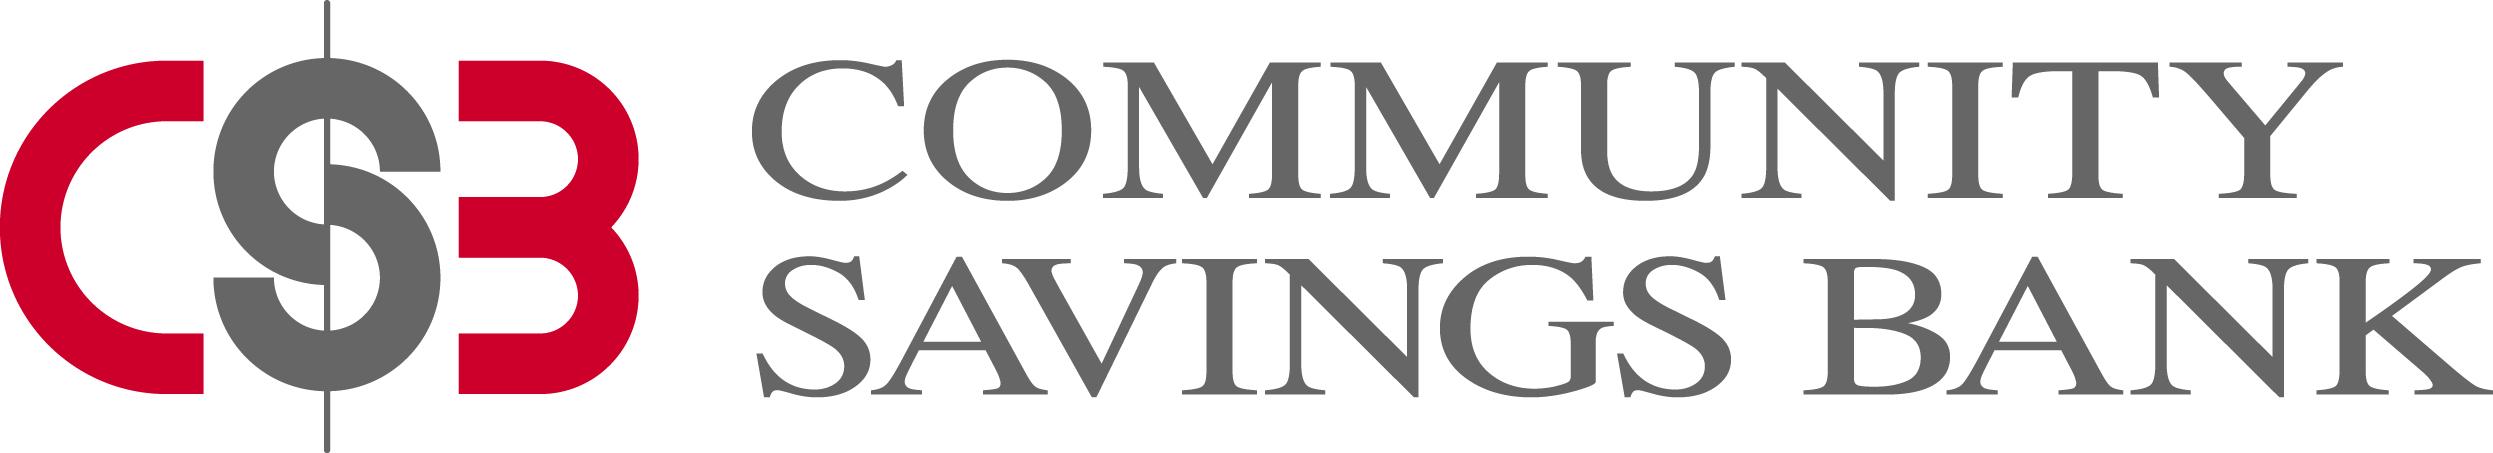 Community Savings Bank